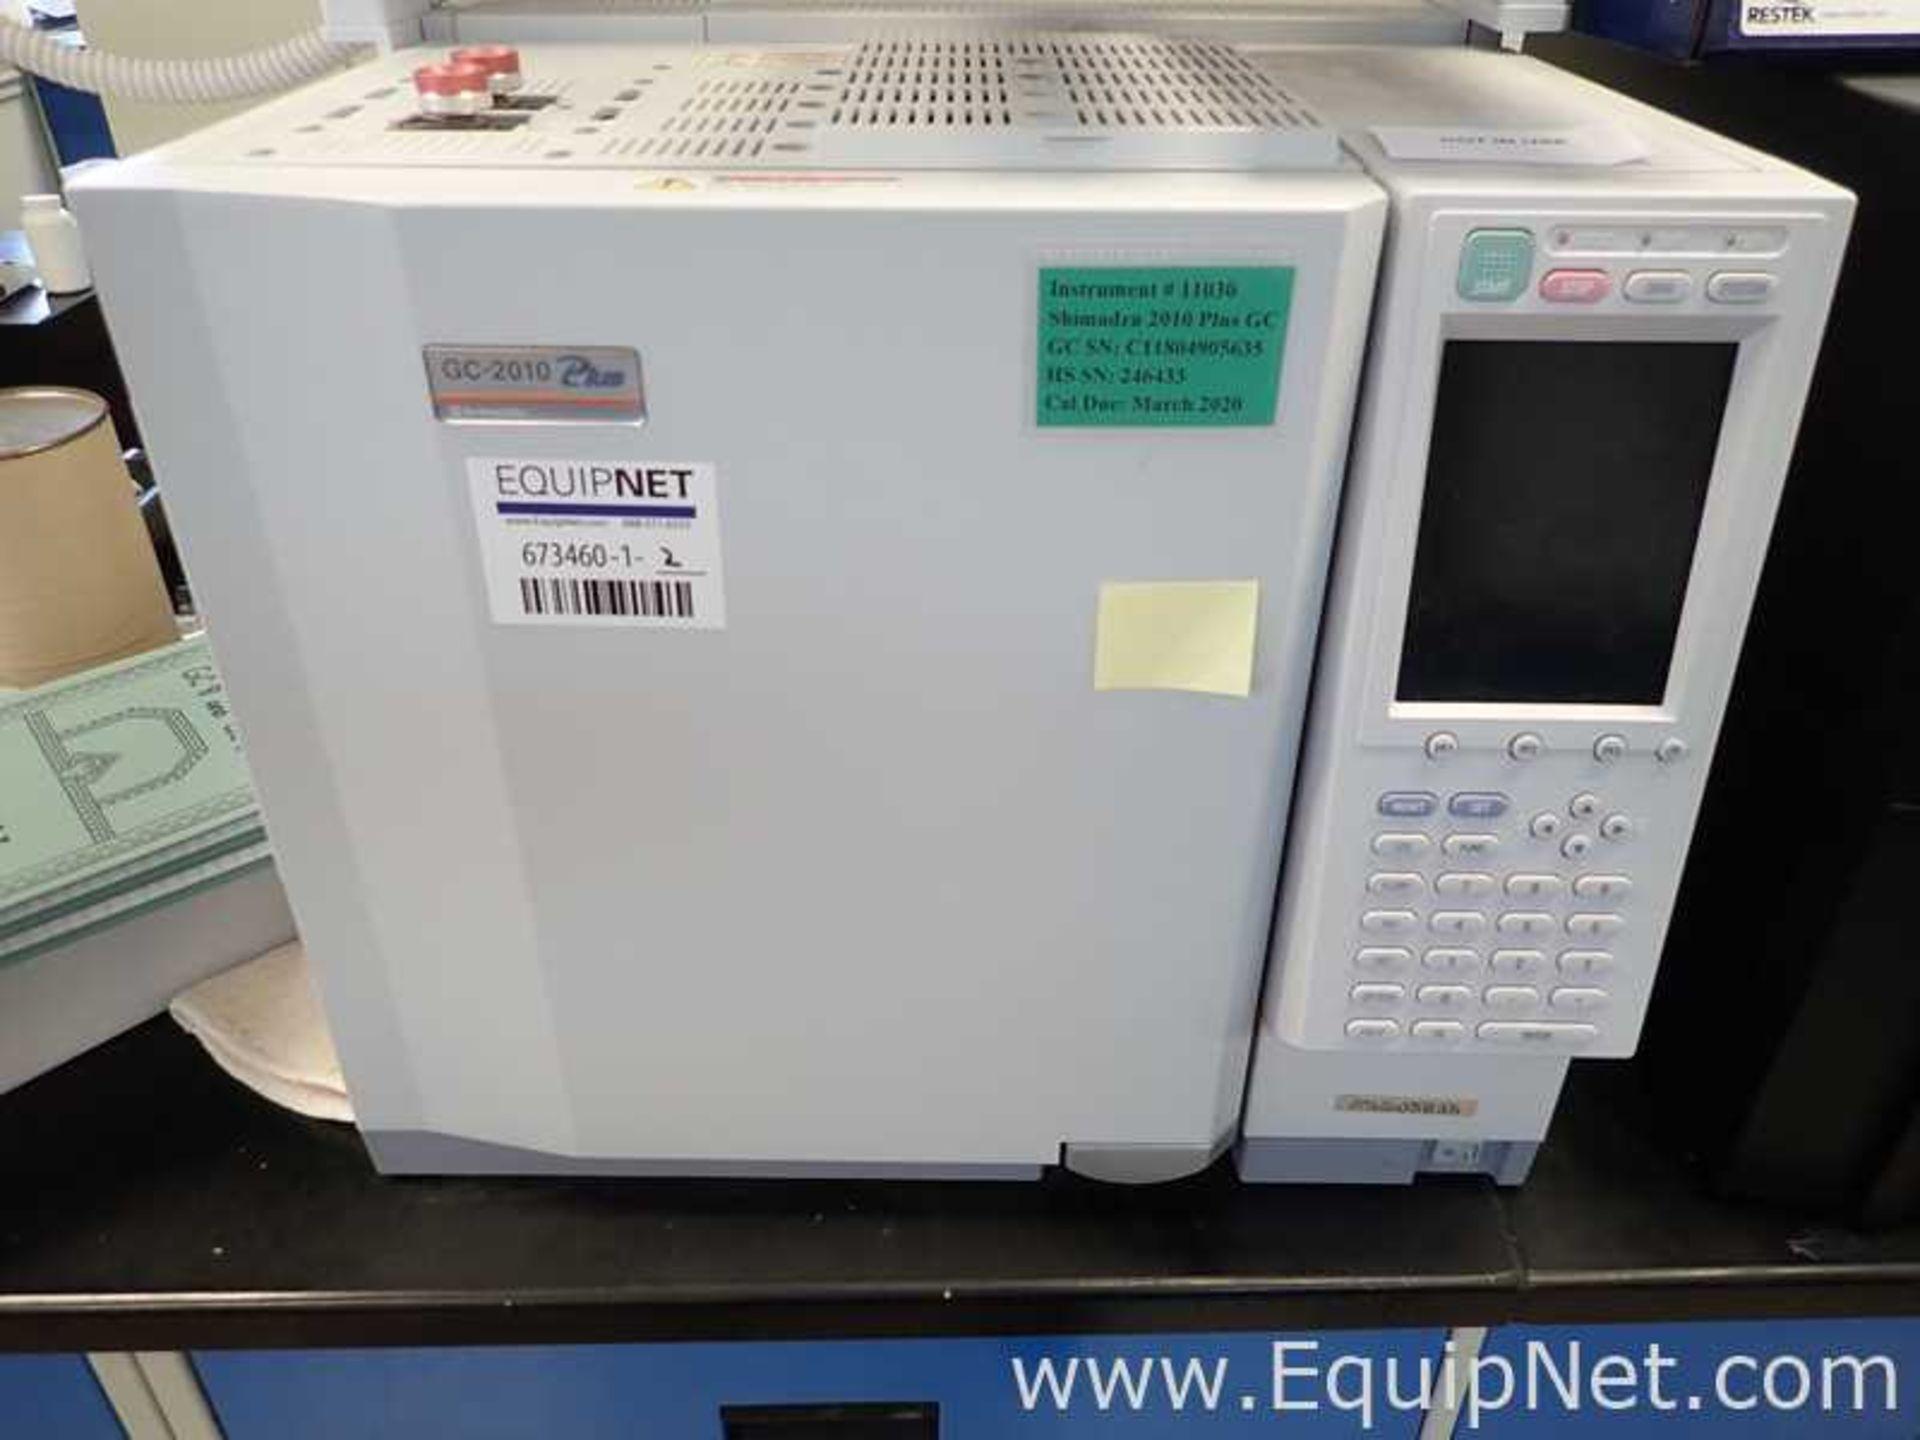 Shimadzu GC-2010 Gas Chromatograph with AOC-5000 Auto Injector - Image 2 of 7